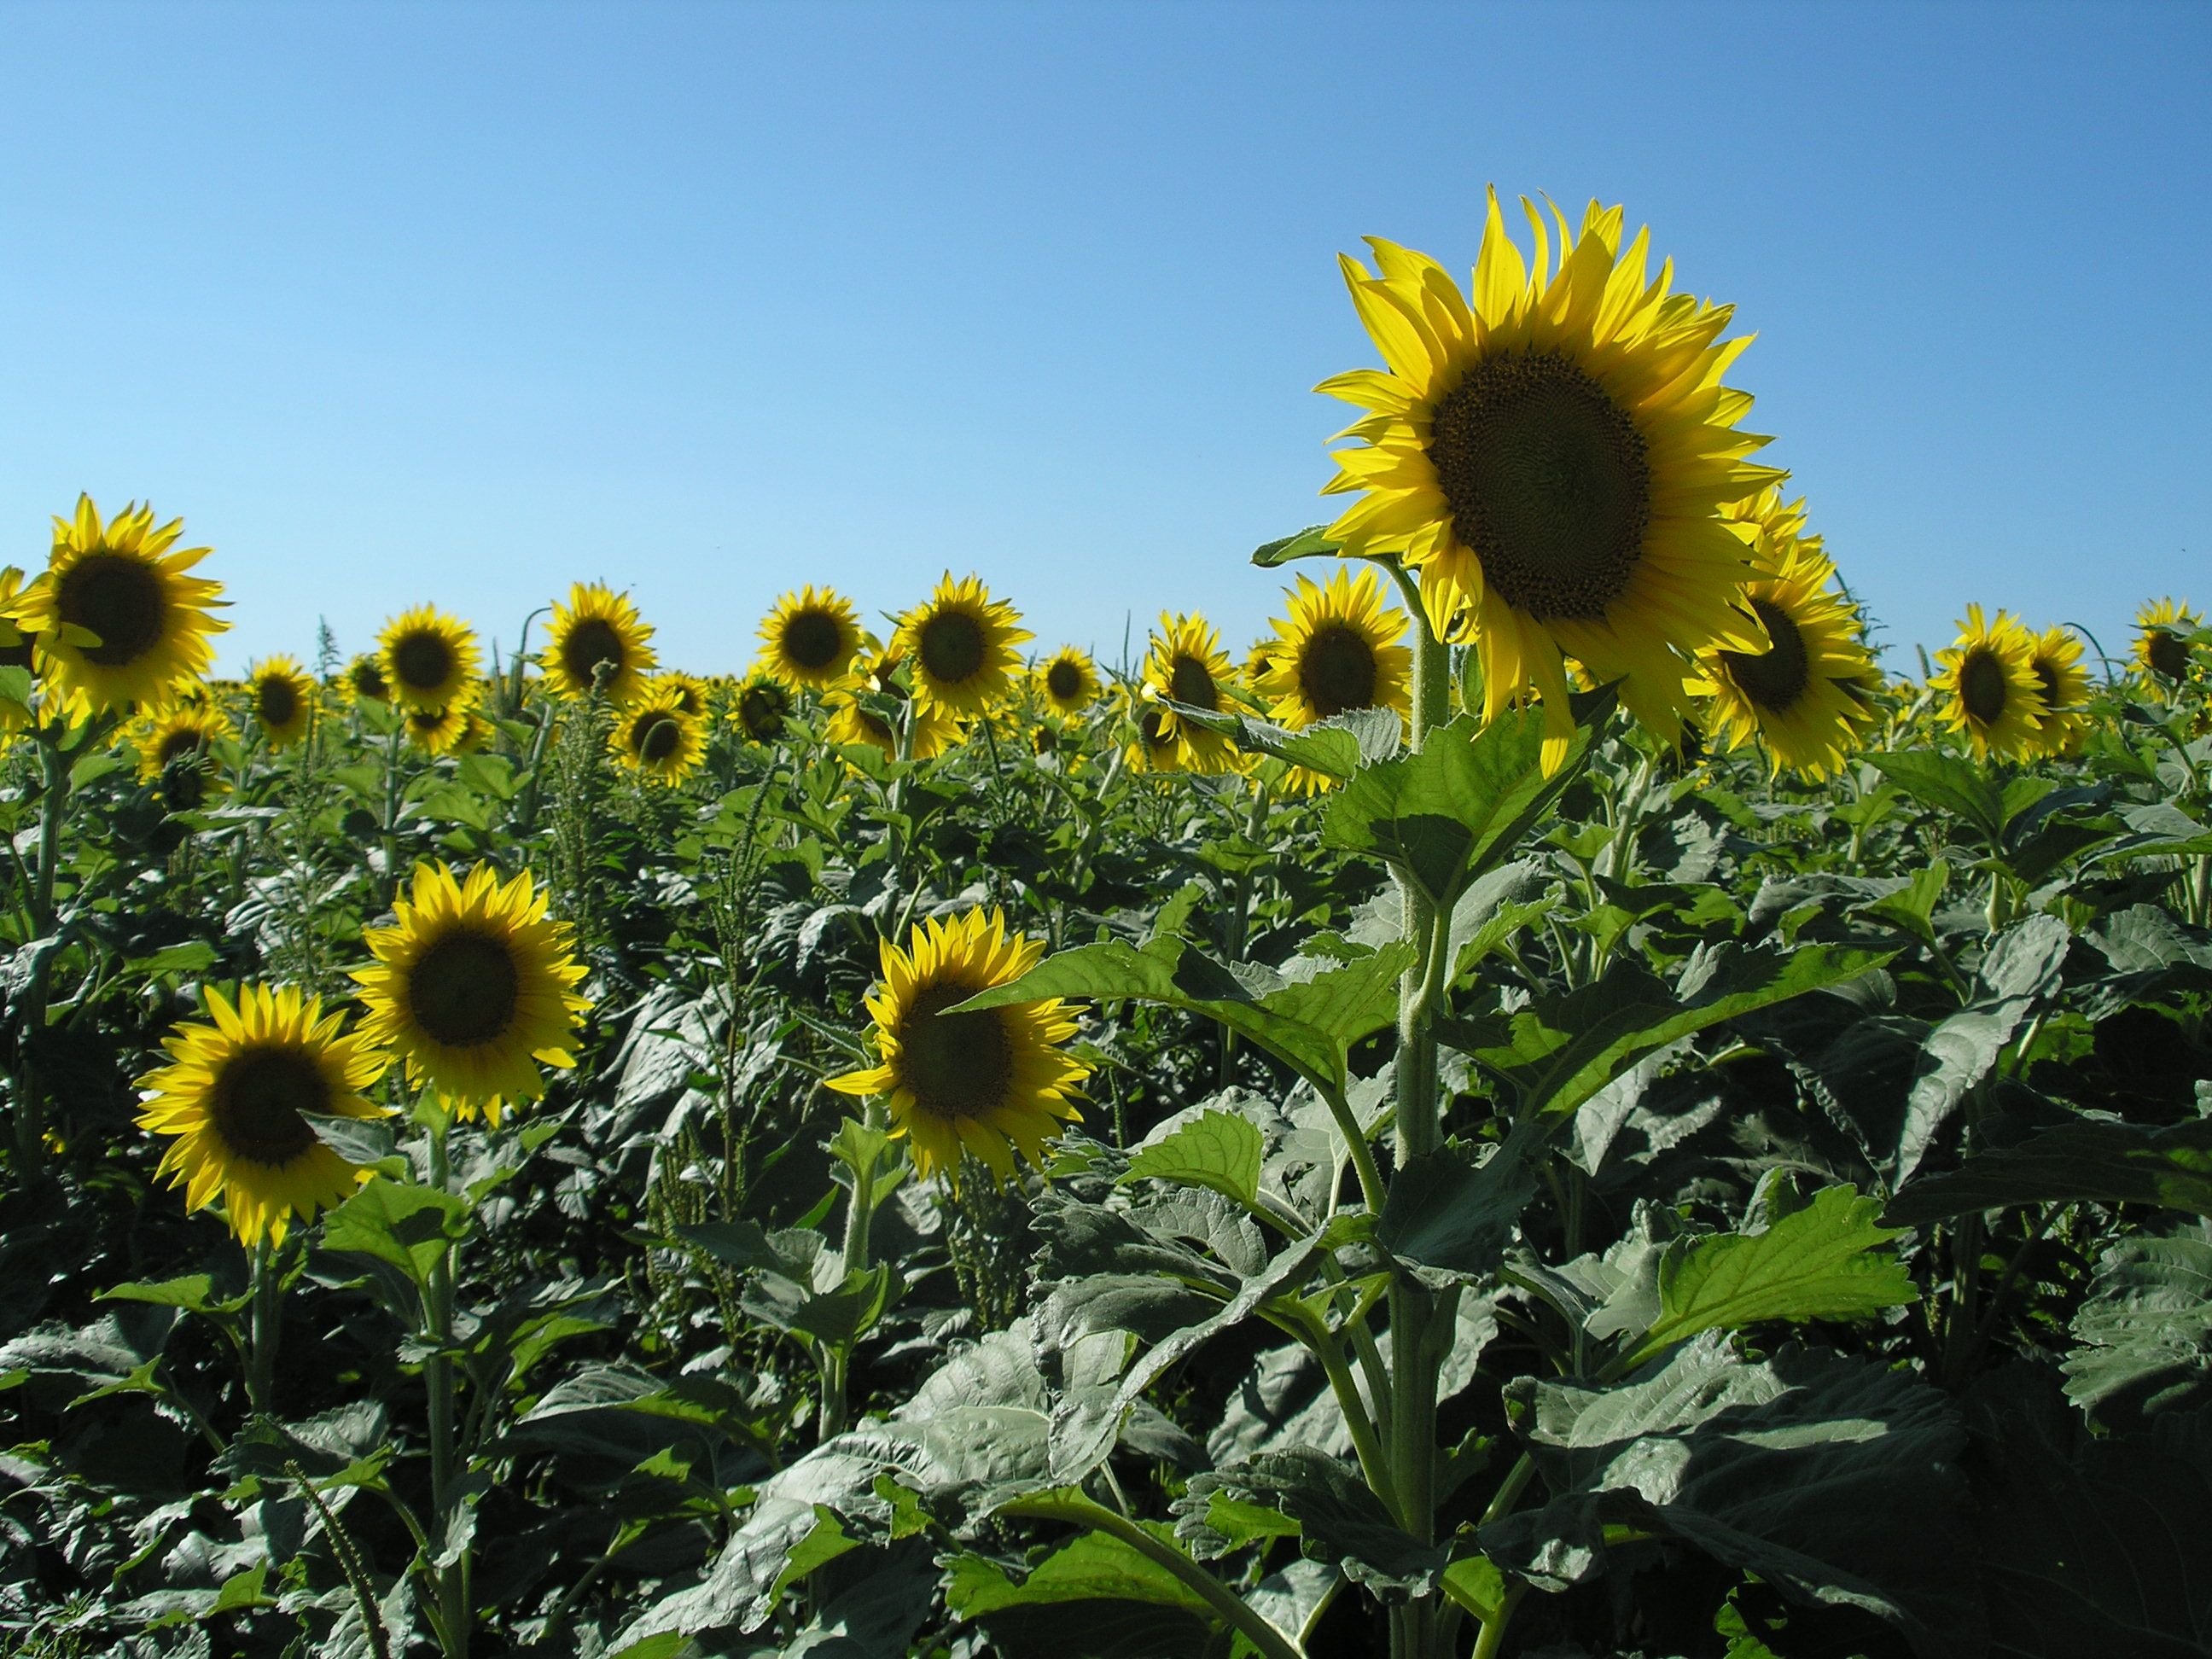 Sunflowers south of McPherson. Photo by Charlie Goolsby. #KansasBeautiful